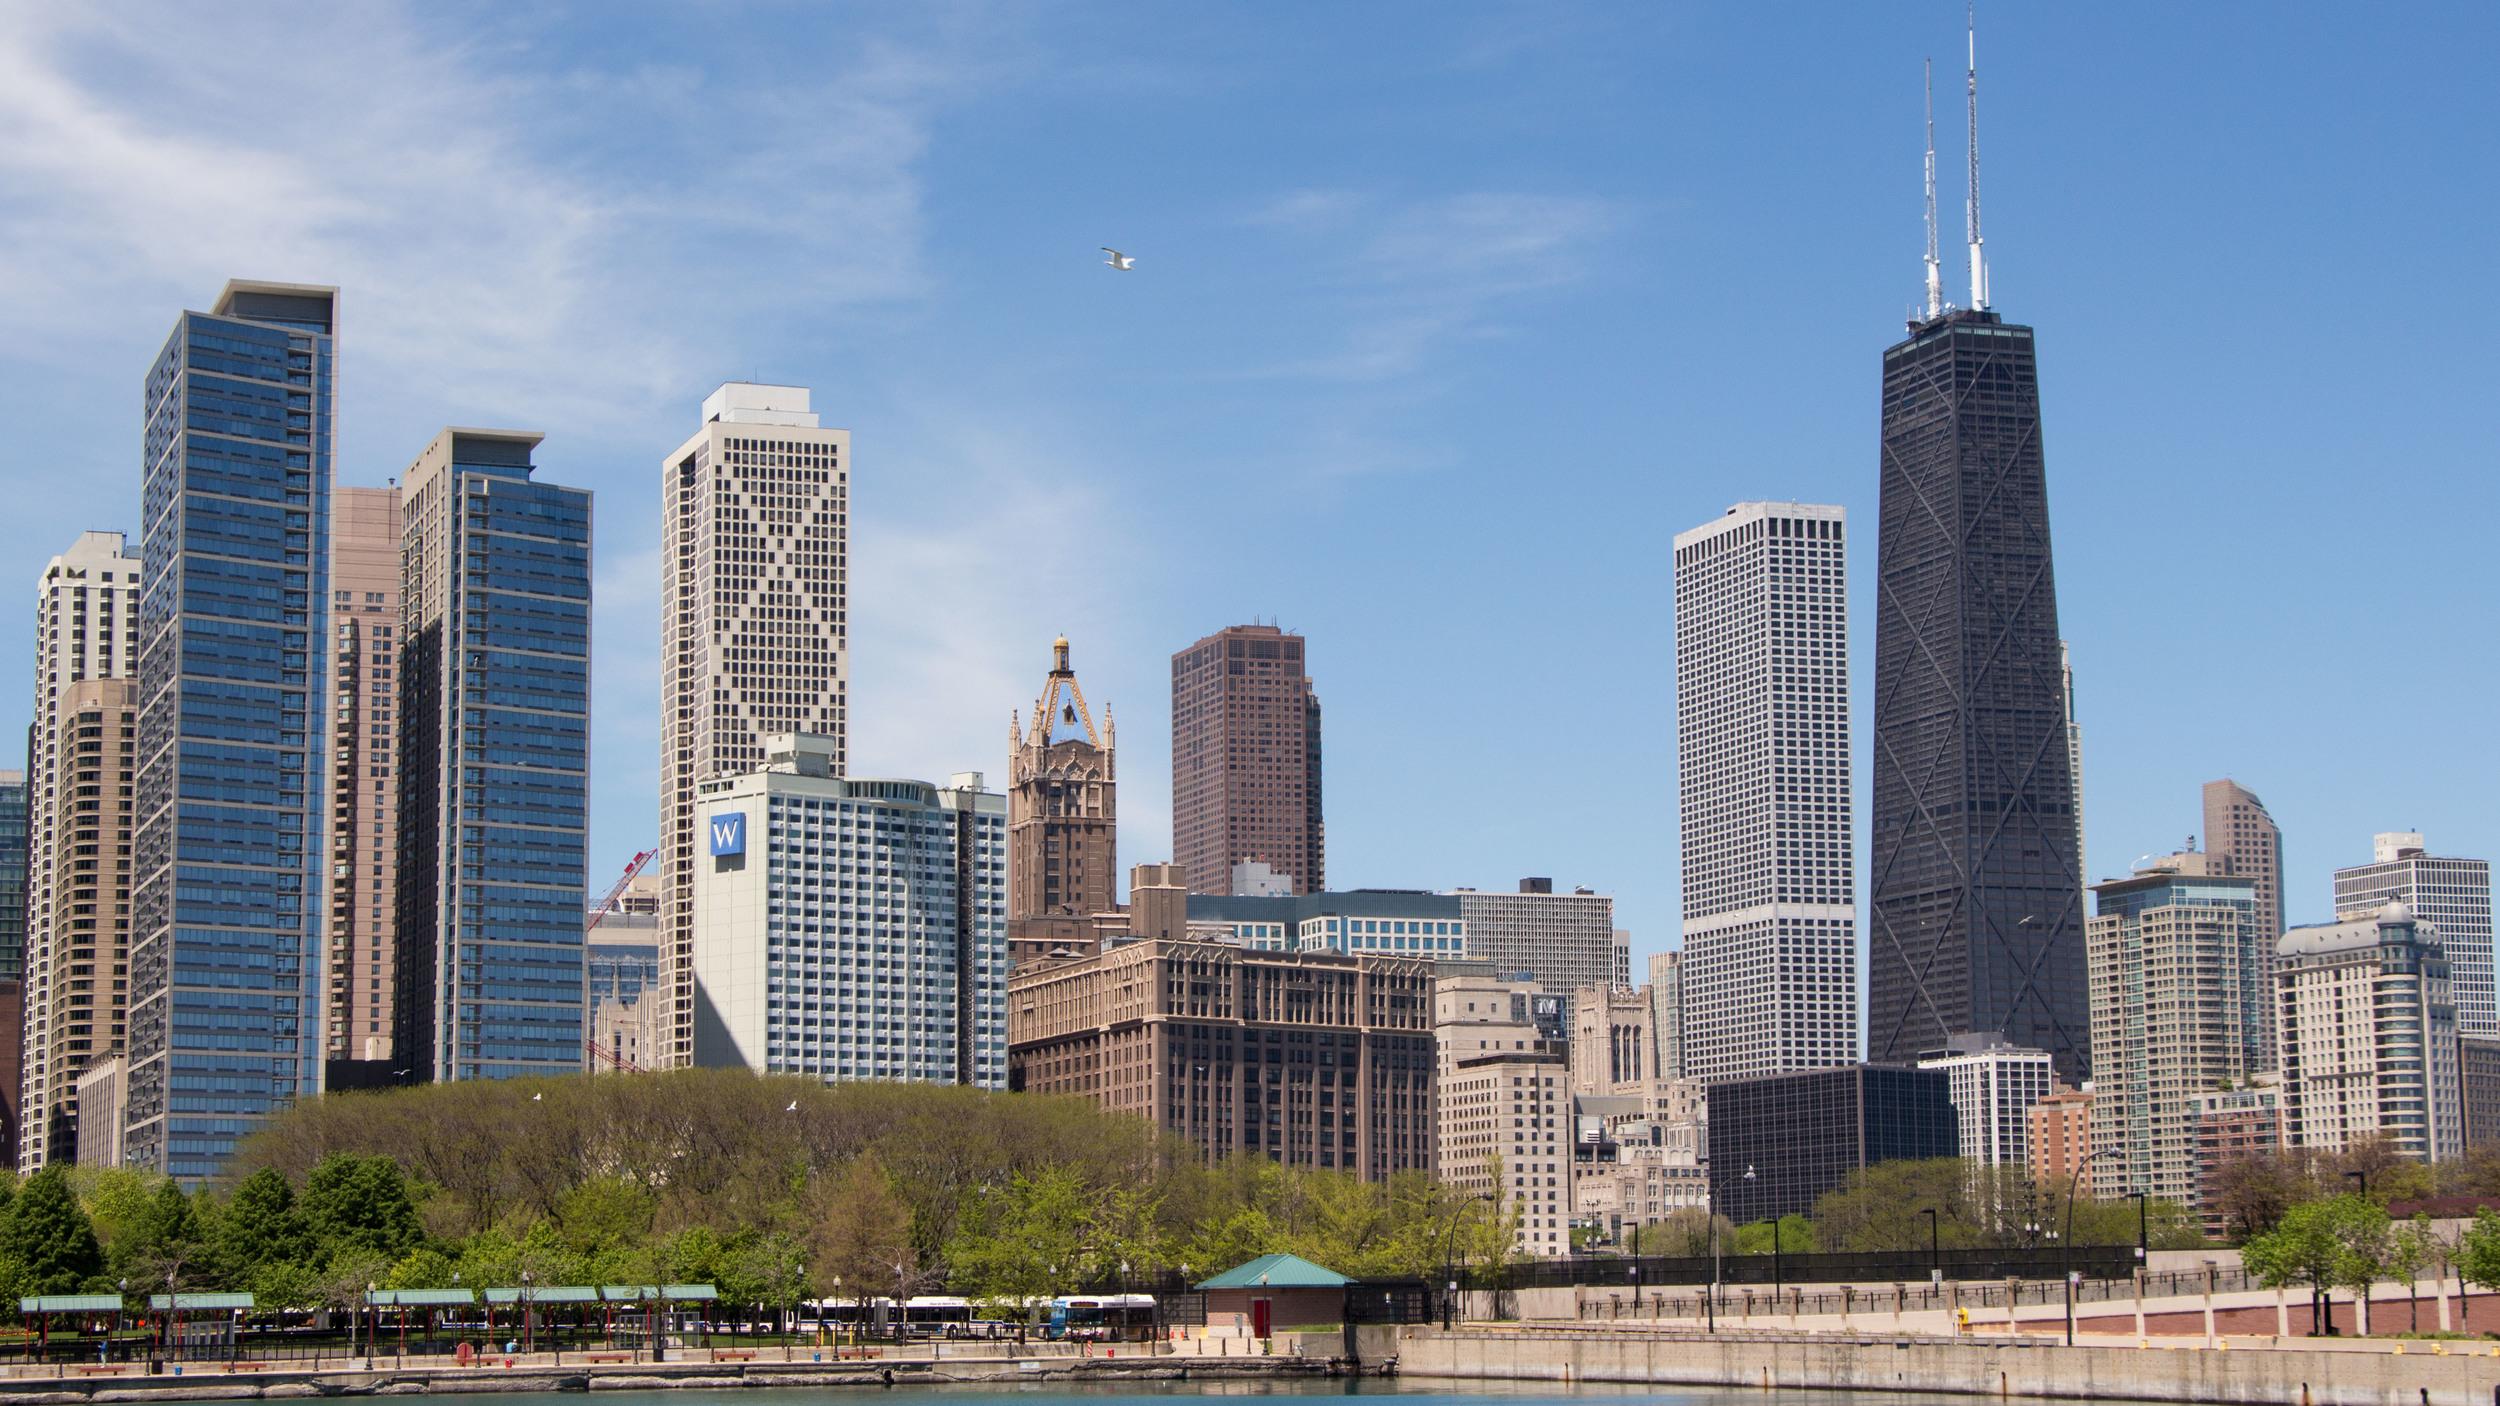 ChicagoSkyline-1.jpg